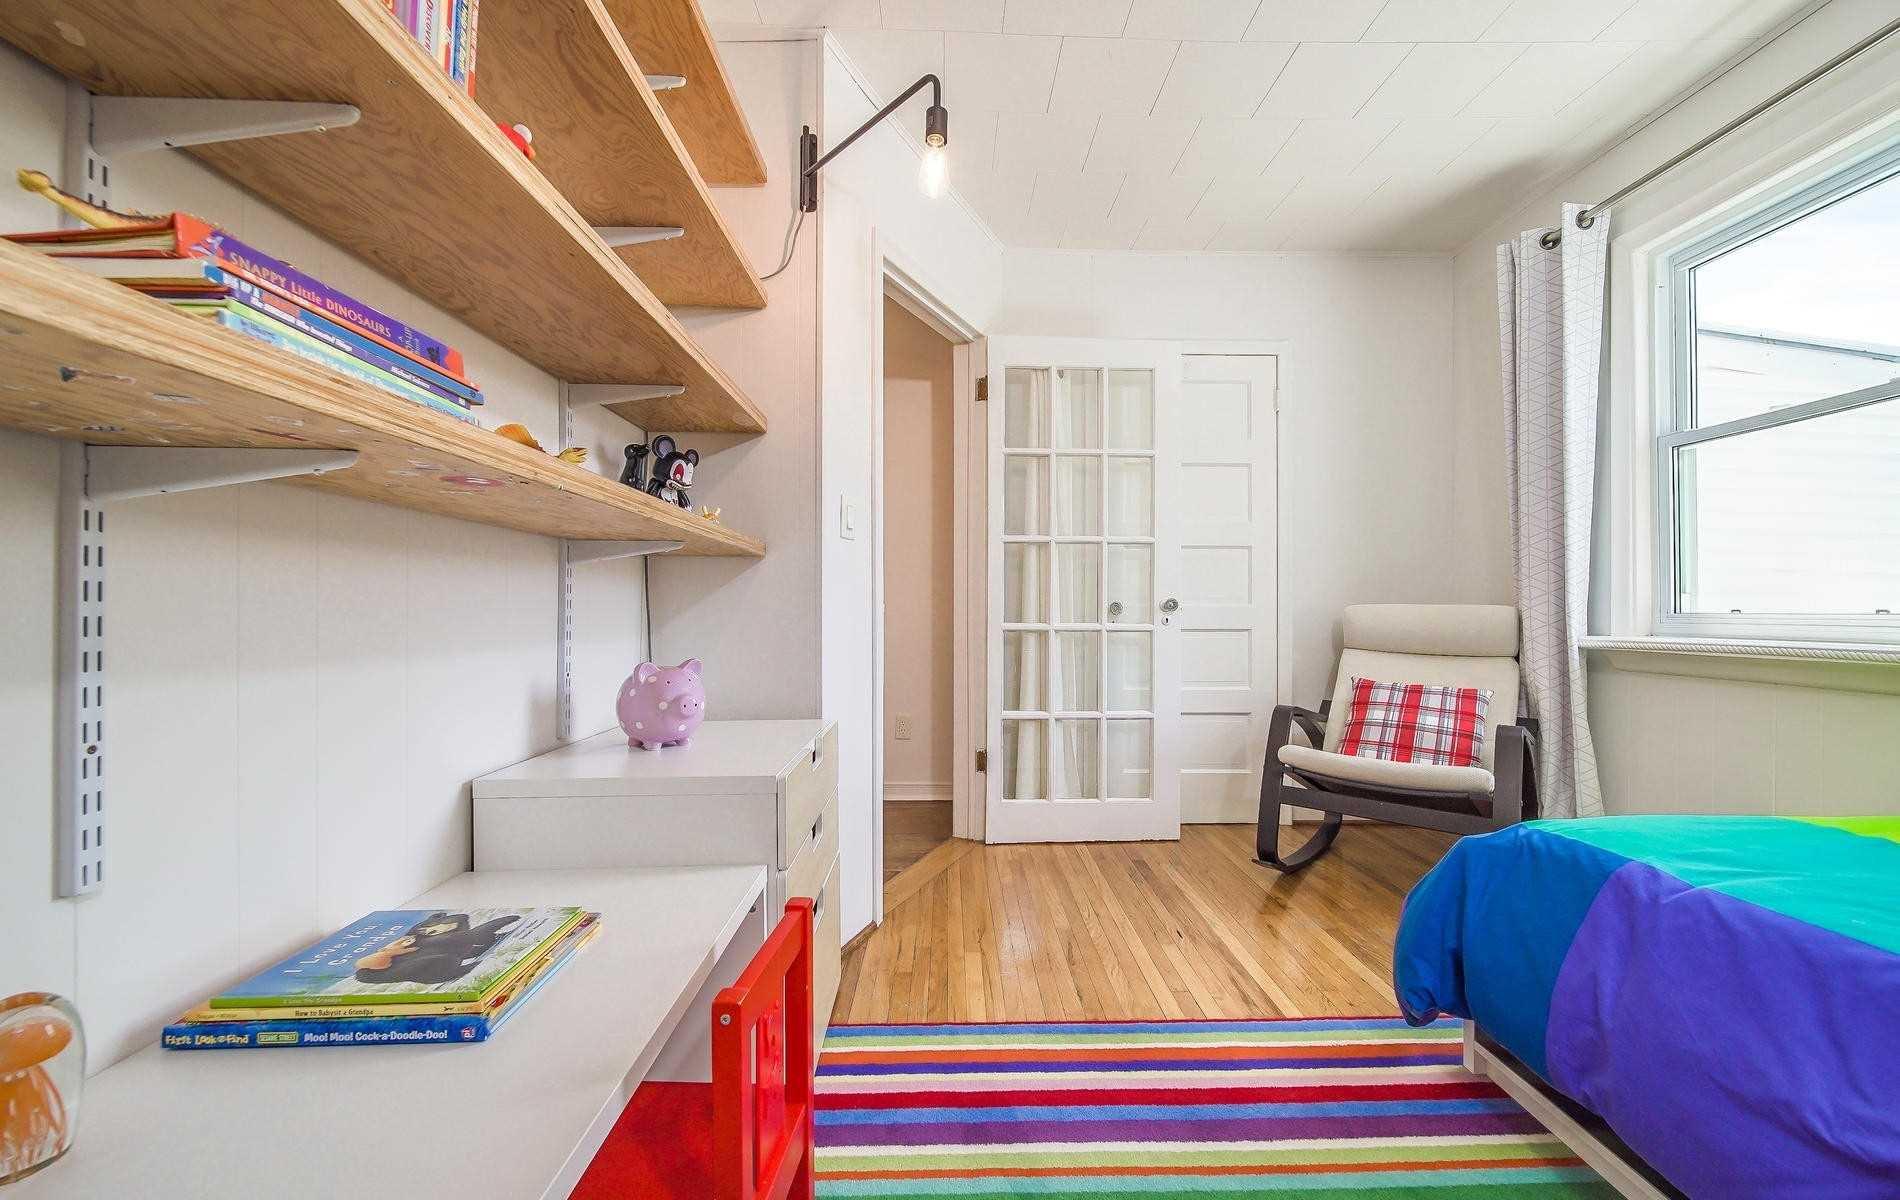 Photo 12: Photos: 64 Larchmount Avenue in Toronto: South Riverdale House (2-Storey) for sale (Toronto E01)  : MLS®# E4489752